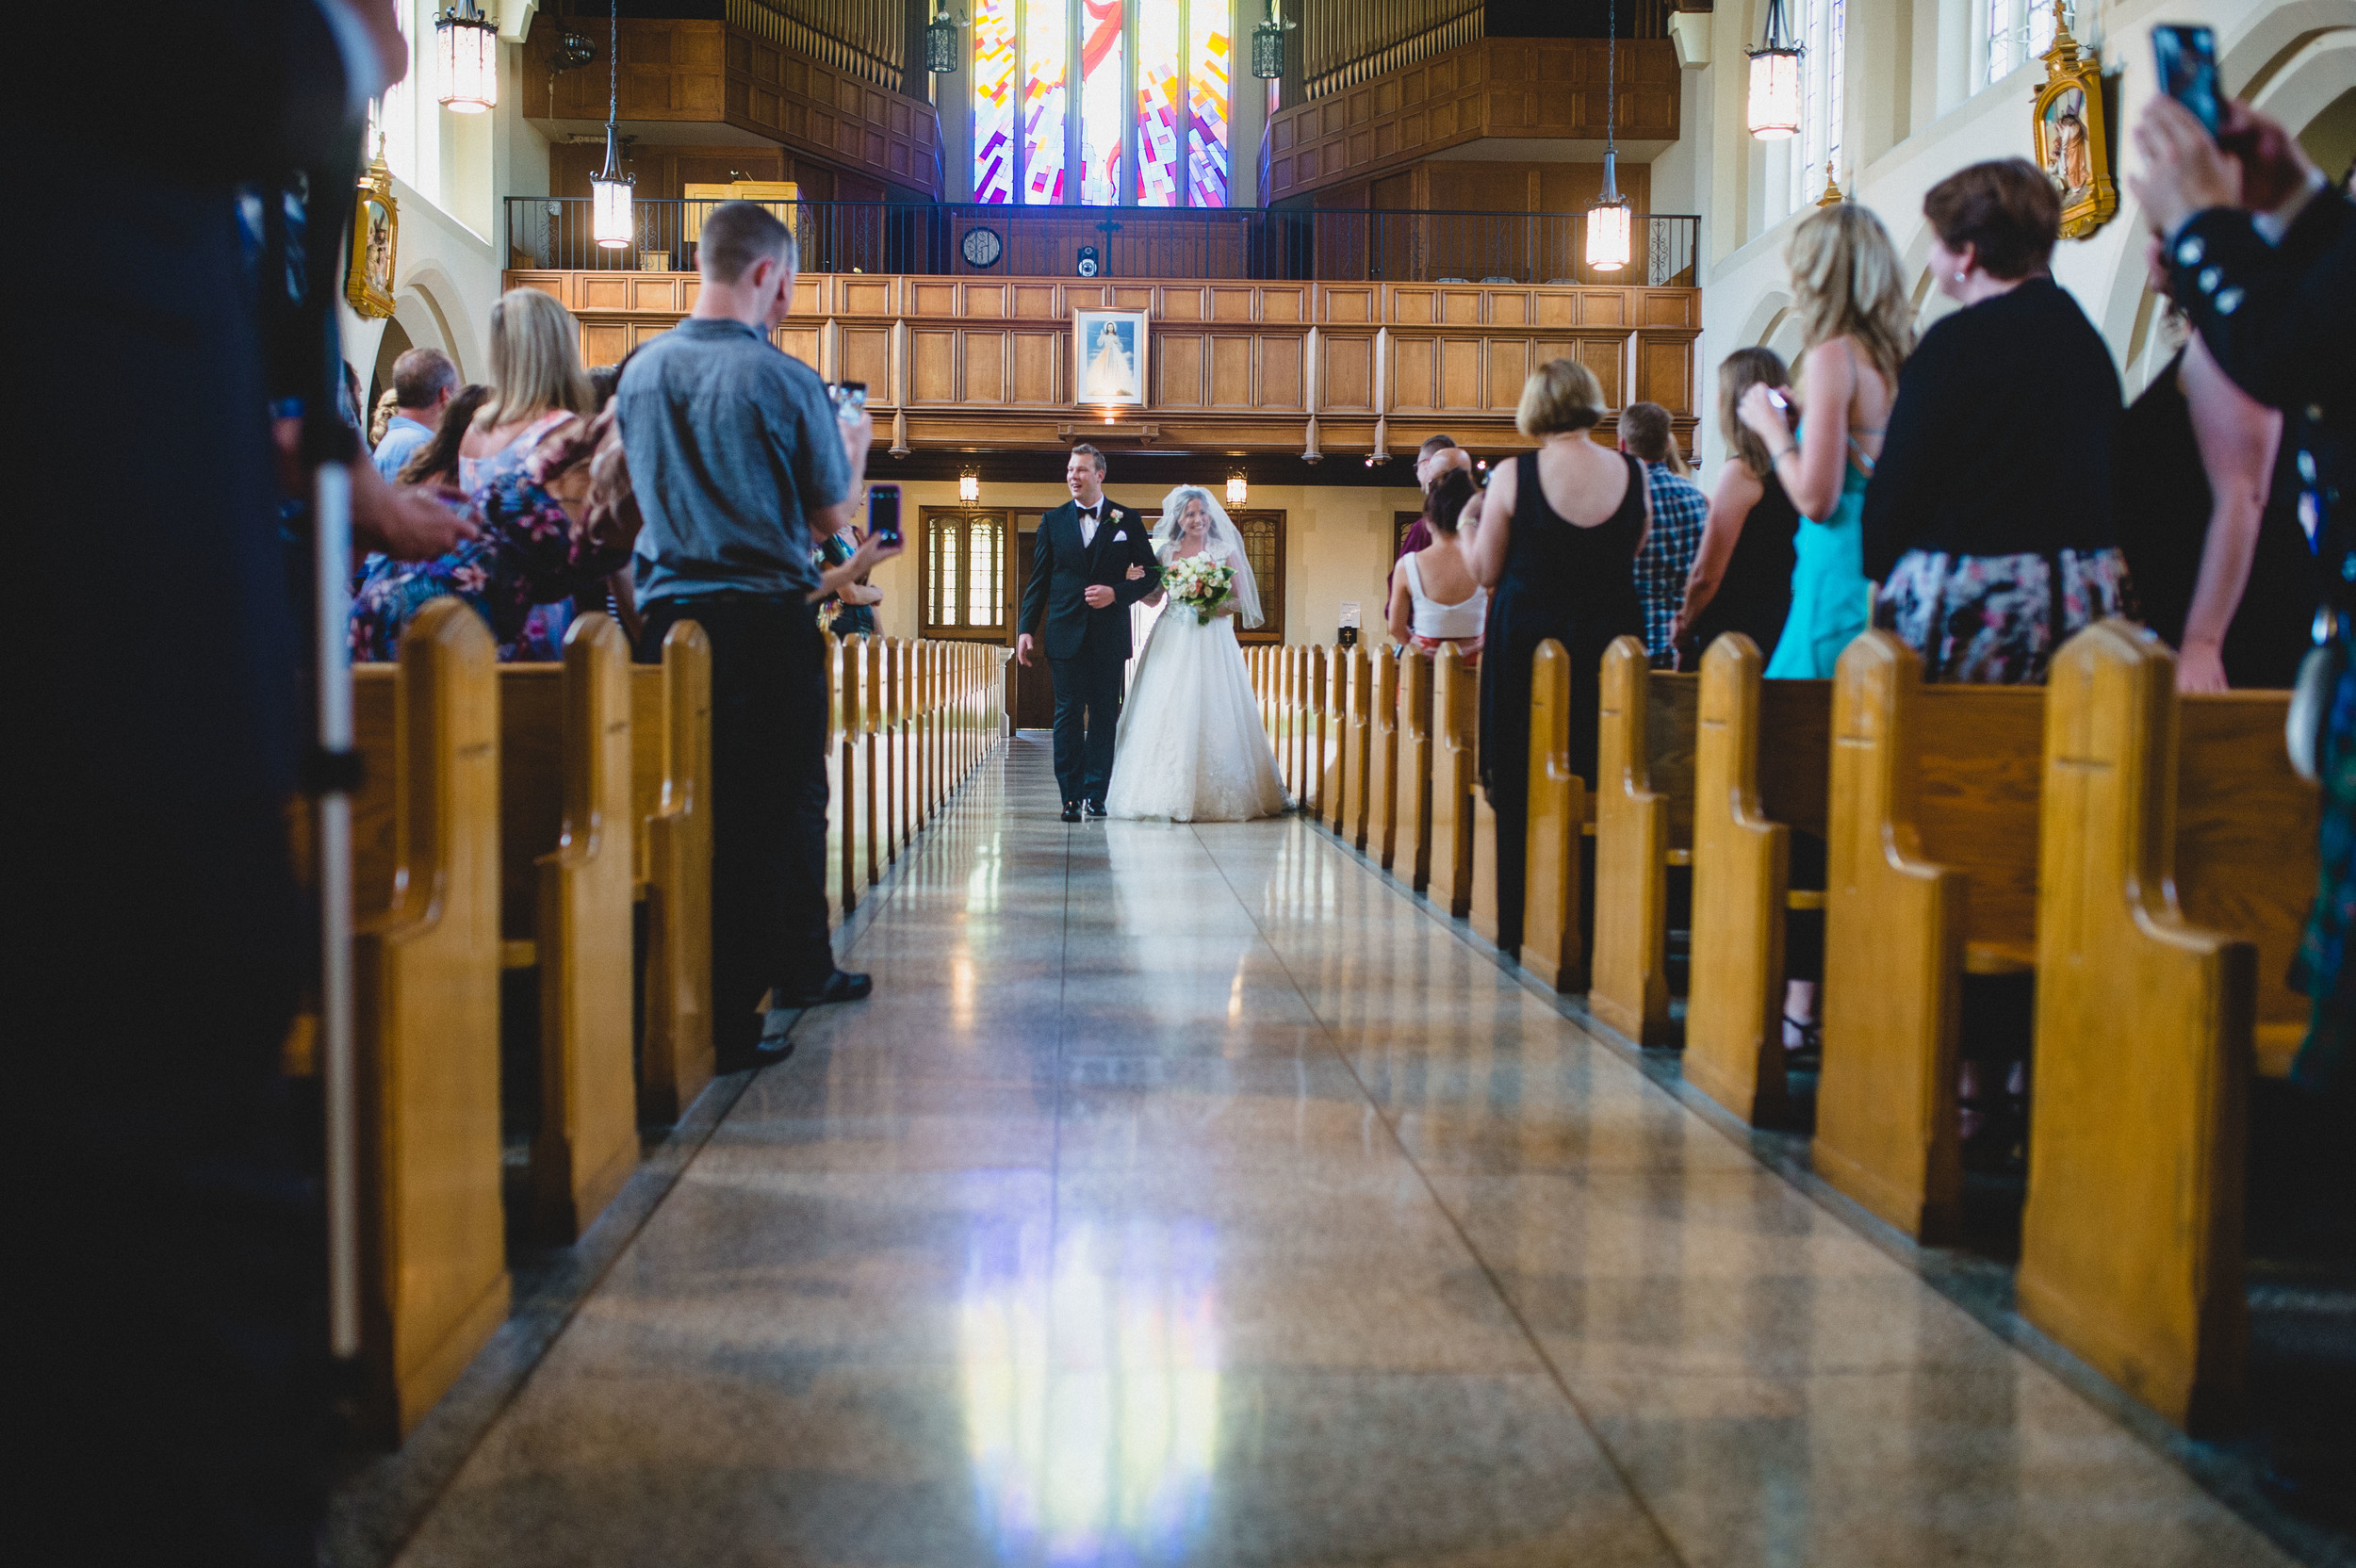 Vancouver St Augustine 's Church wedding photographer edward lai photography-34.jpg